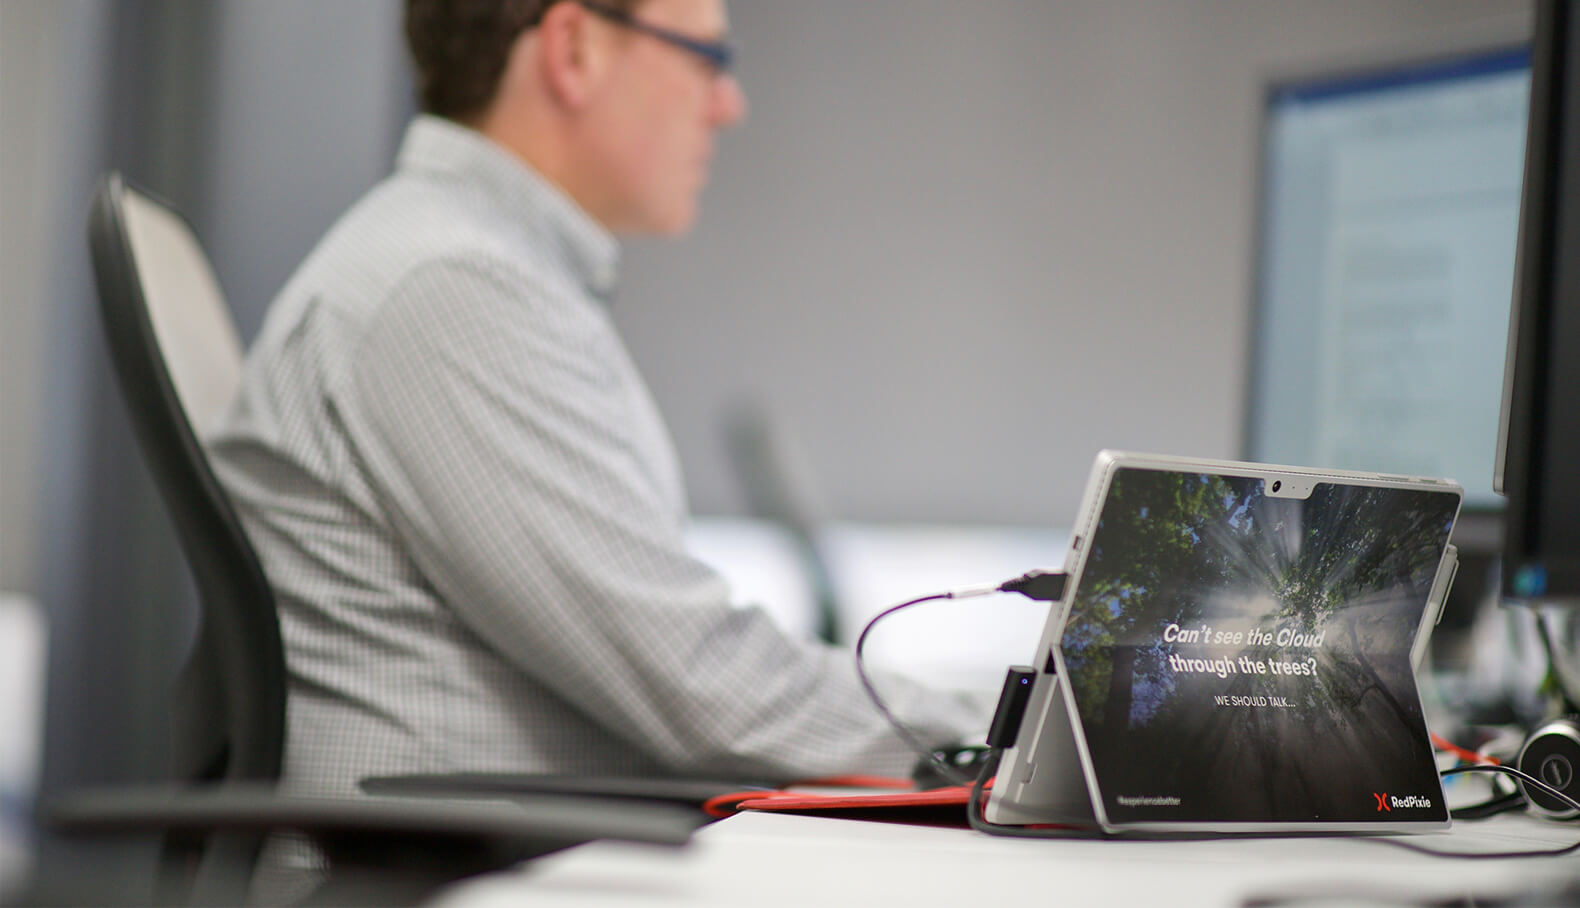 citrix on azure surface laptop